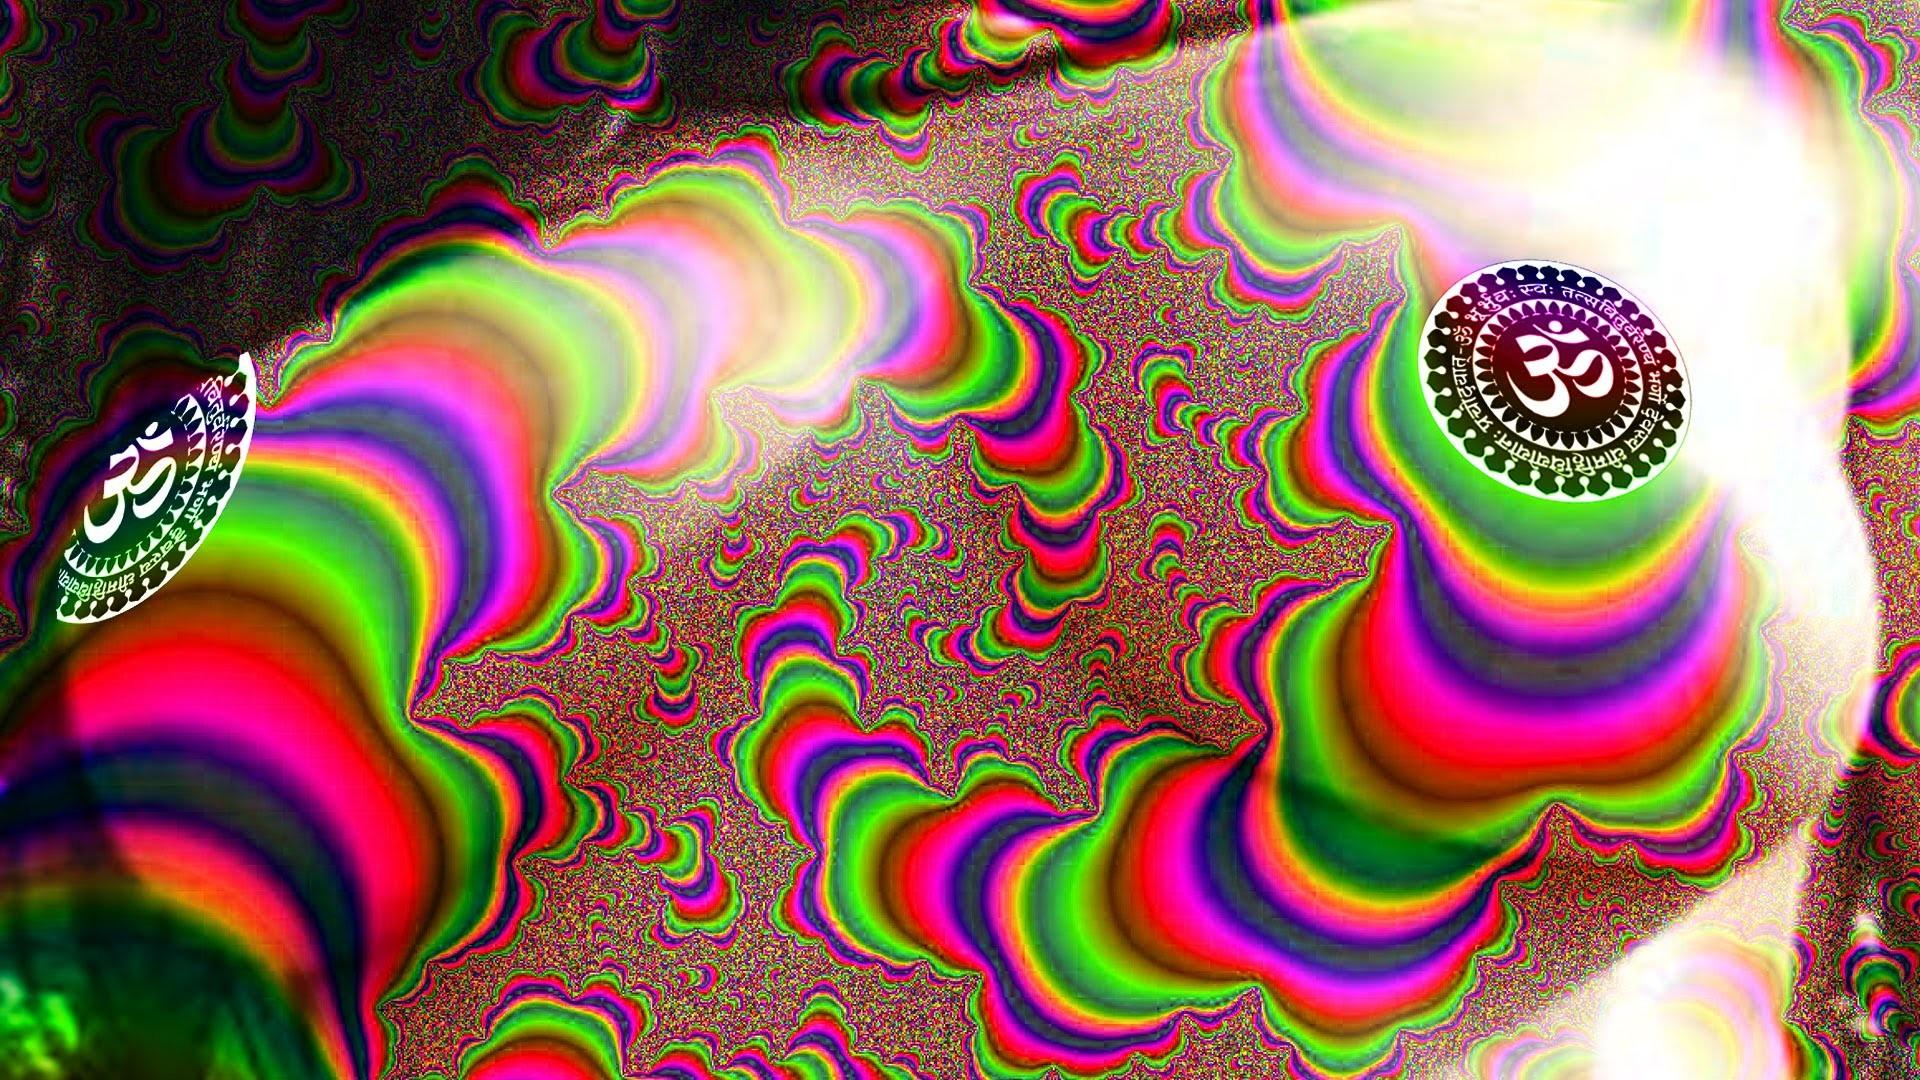 Psyshop Psytrance amp Goatrance Progressive DJ Music CD